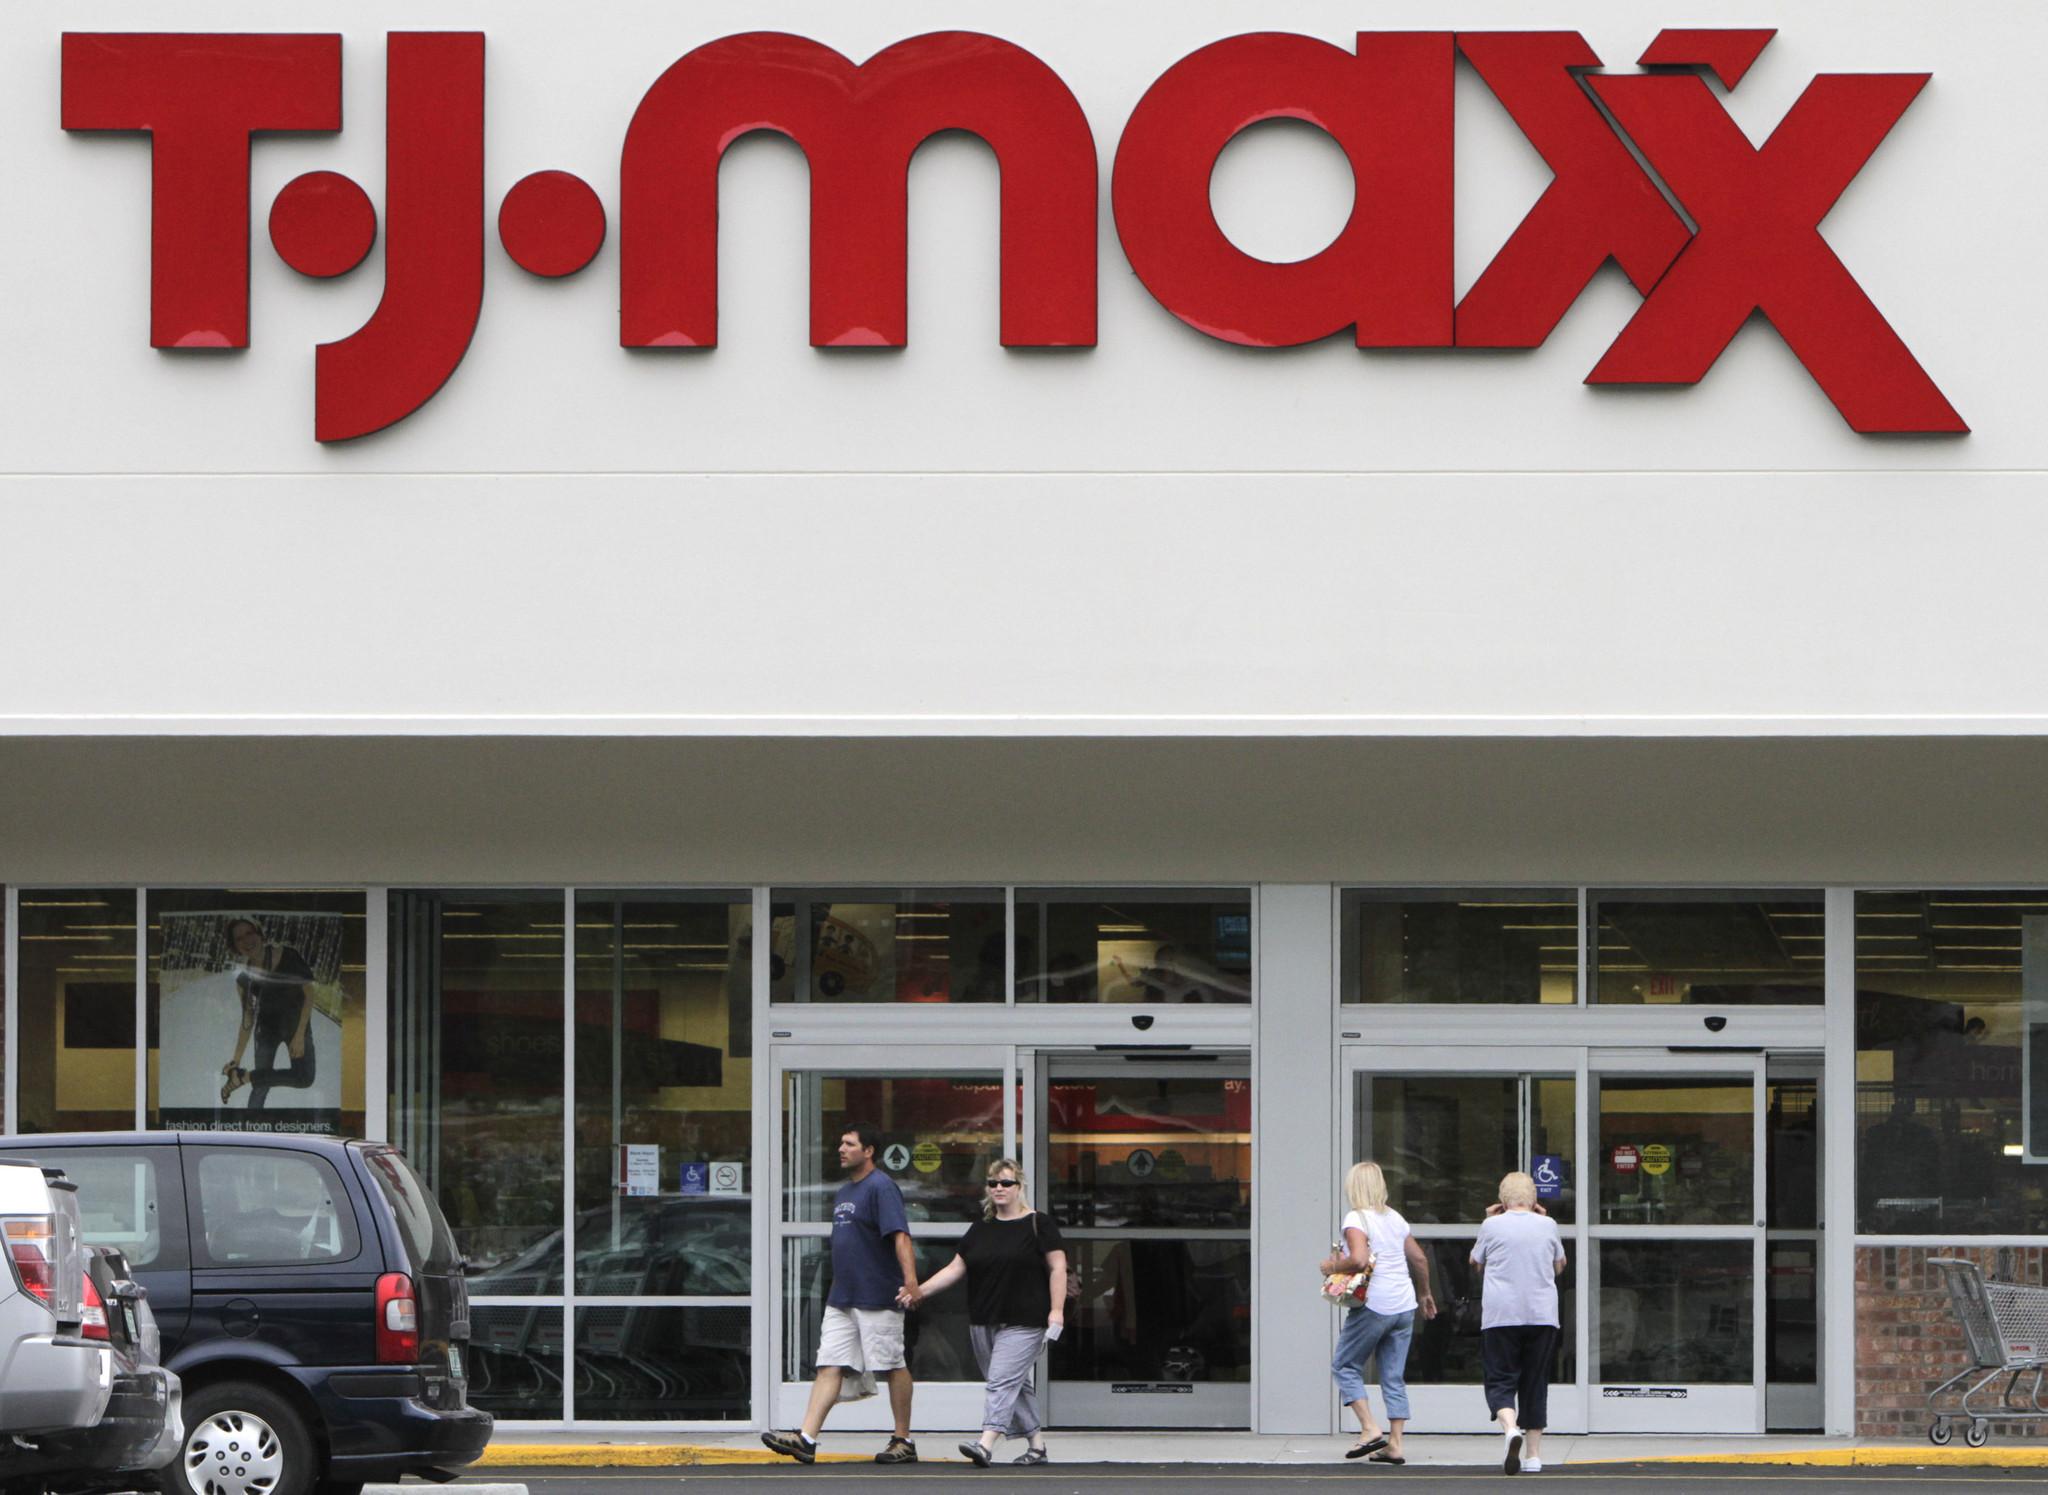 http://www.chicagotribune.com/business/ct-tj-maxx-thriving-retail-struggles-20160517-story.html